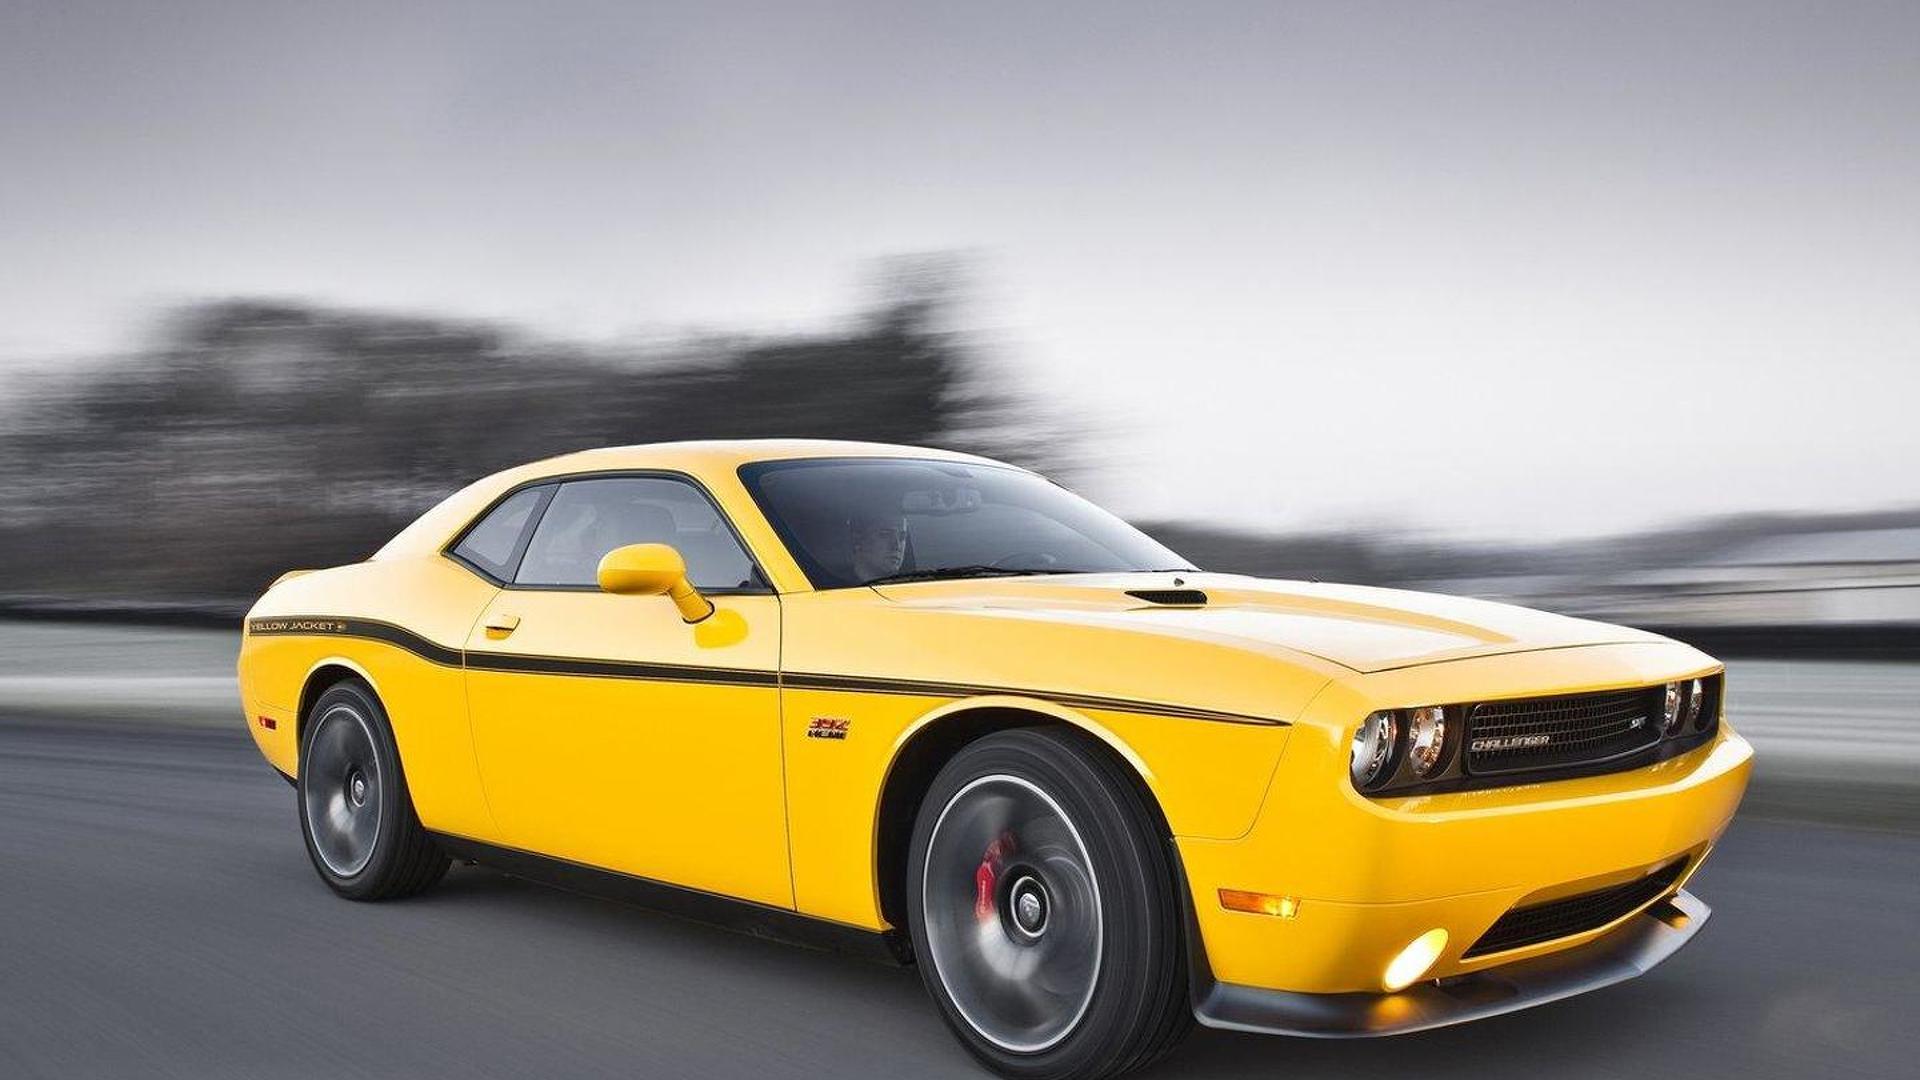 Dodge Barracuda 2015 >> Srt Barracuda Replacement For Challenger In 2015 Report